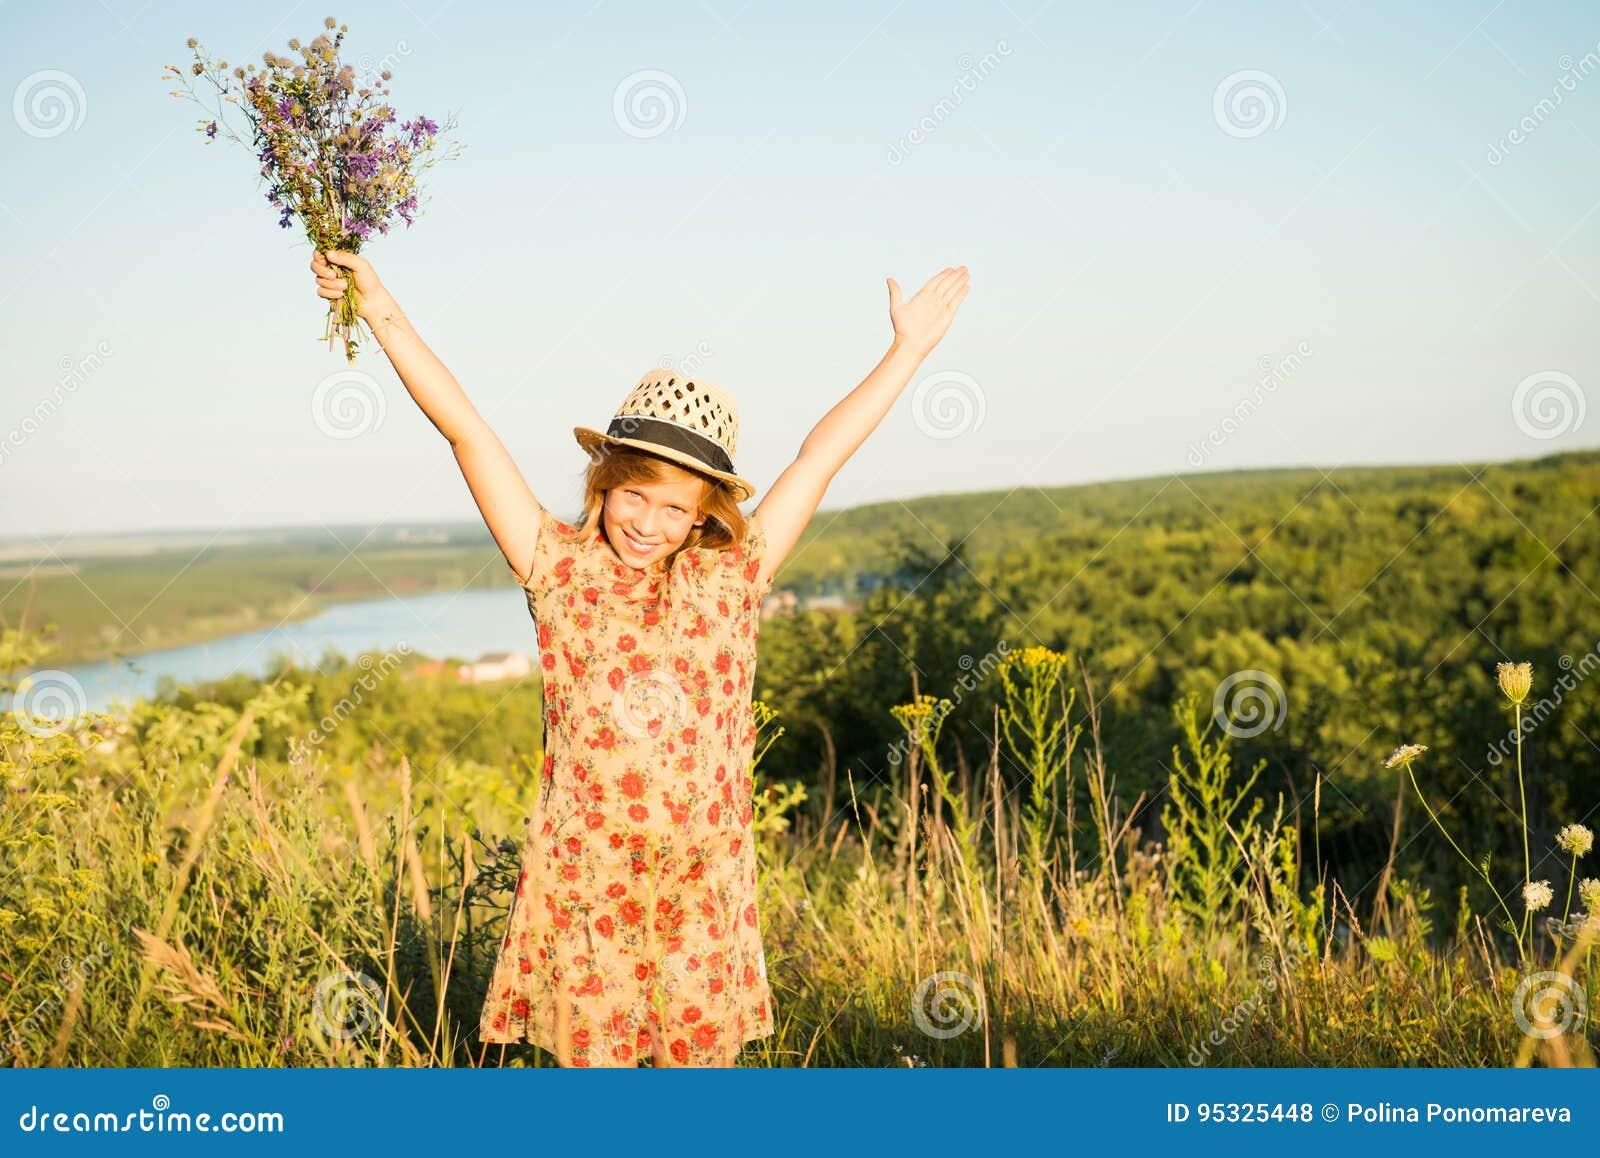 Gelukkig kind in openlucht in de heuvel Ontspannen meisje die wapens opheffen bij s